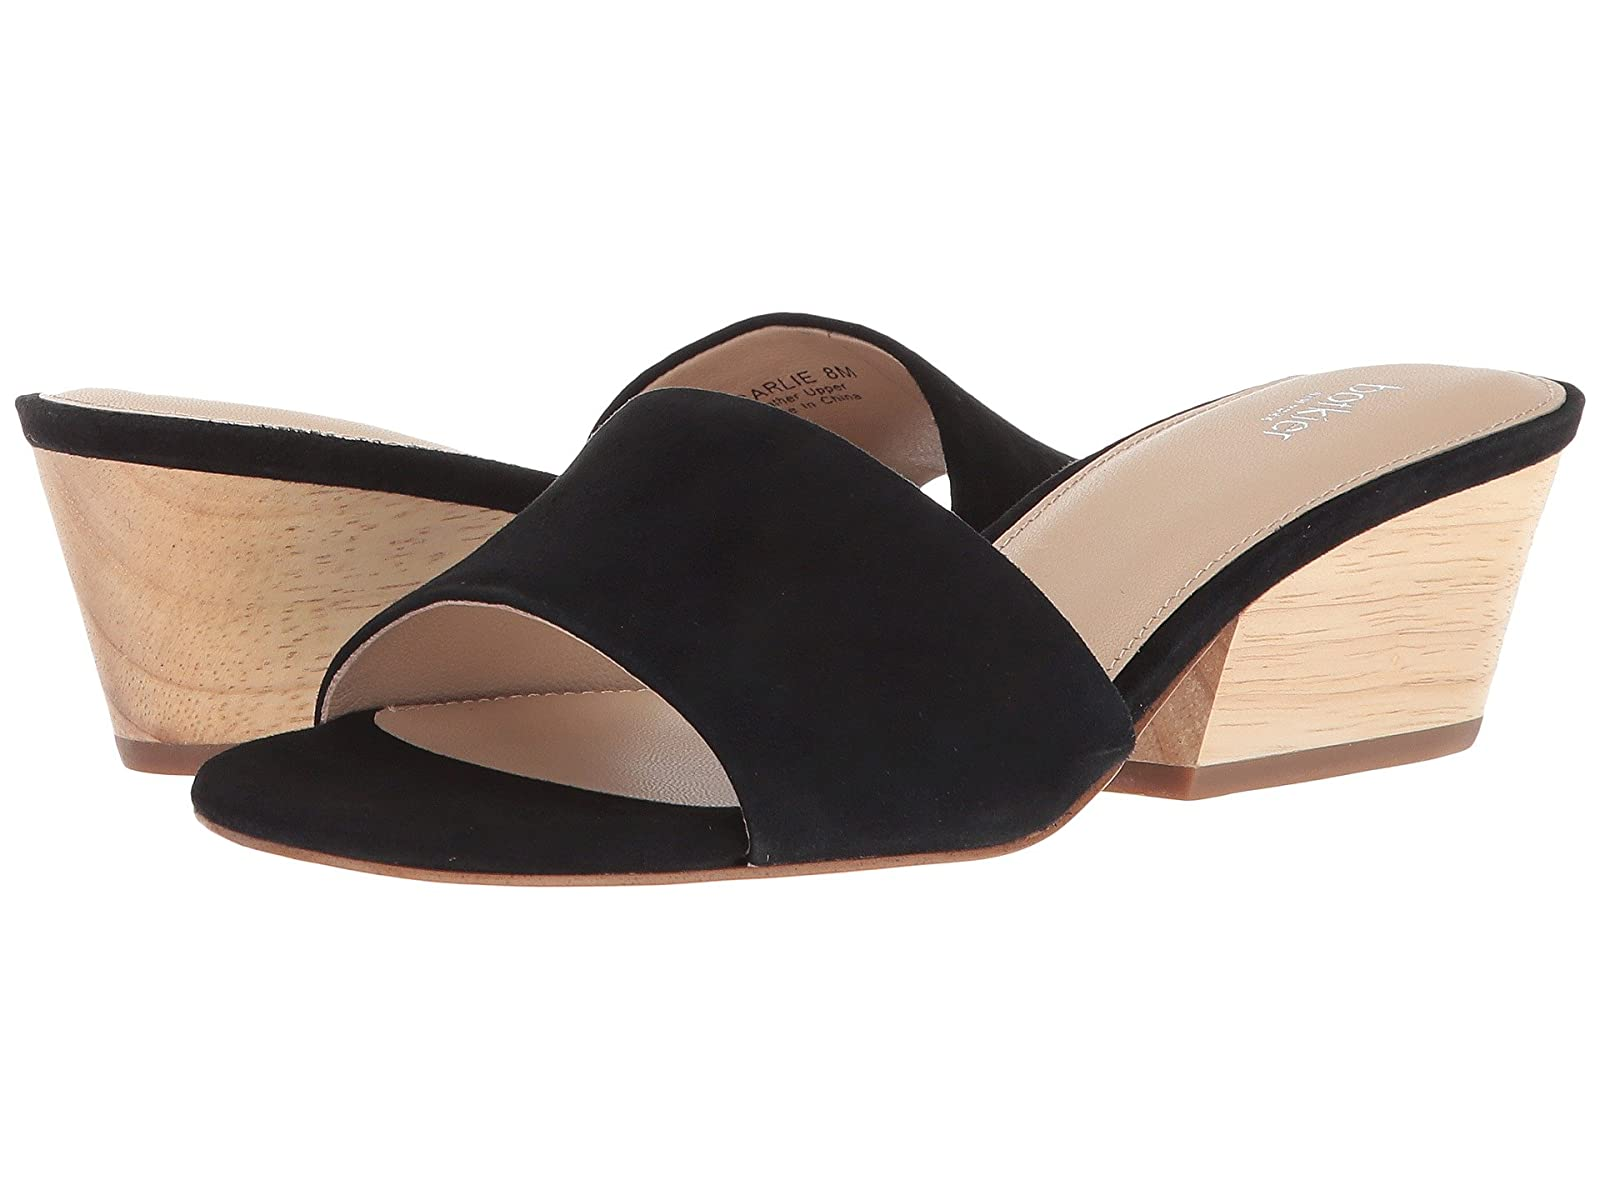 Botkier CarlieAtmospheric grades have affordable shoes